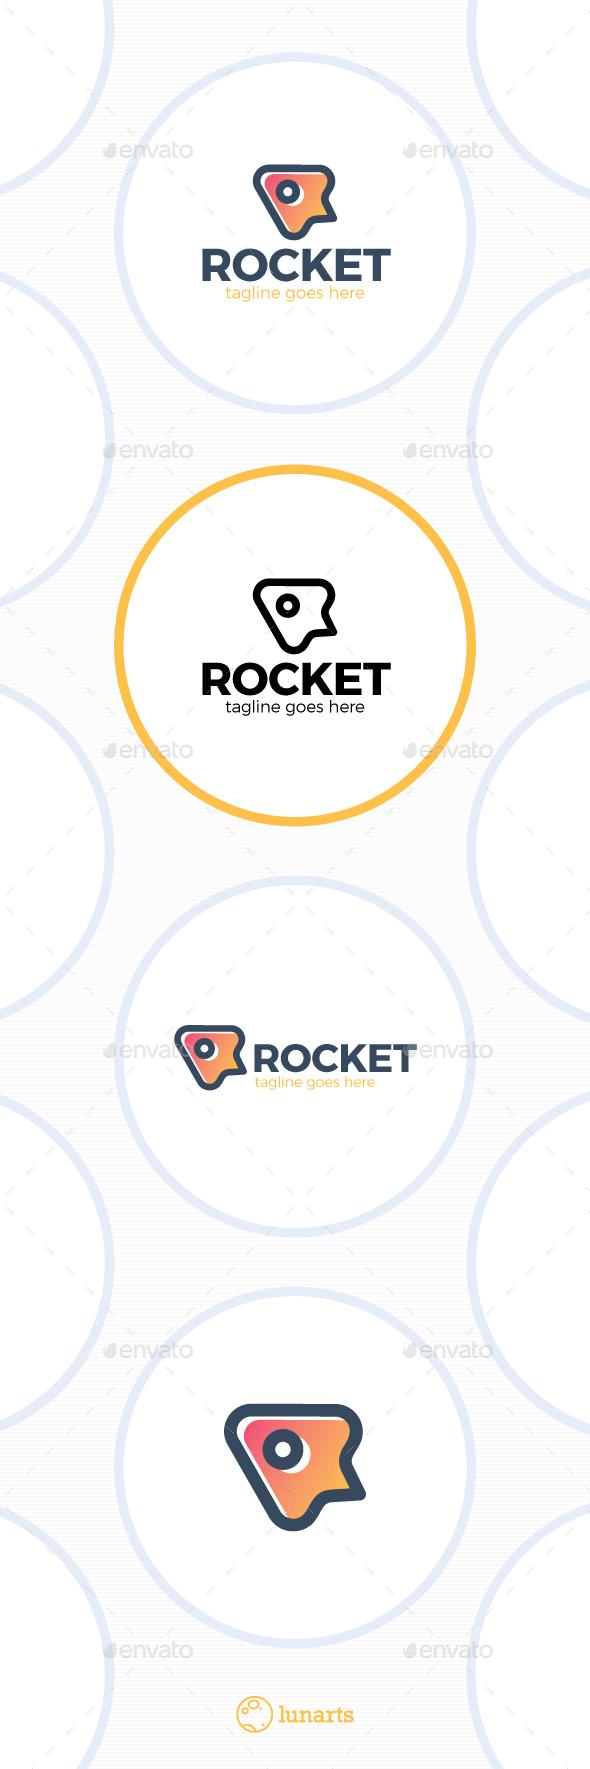 Simple Rocket Logo